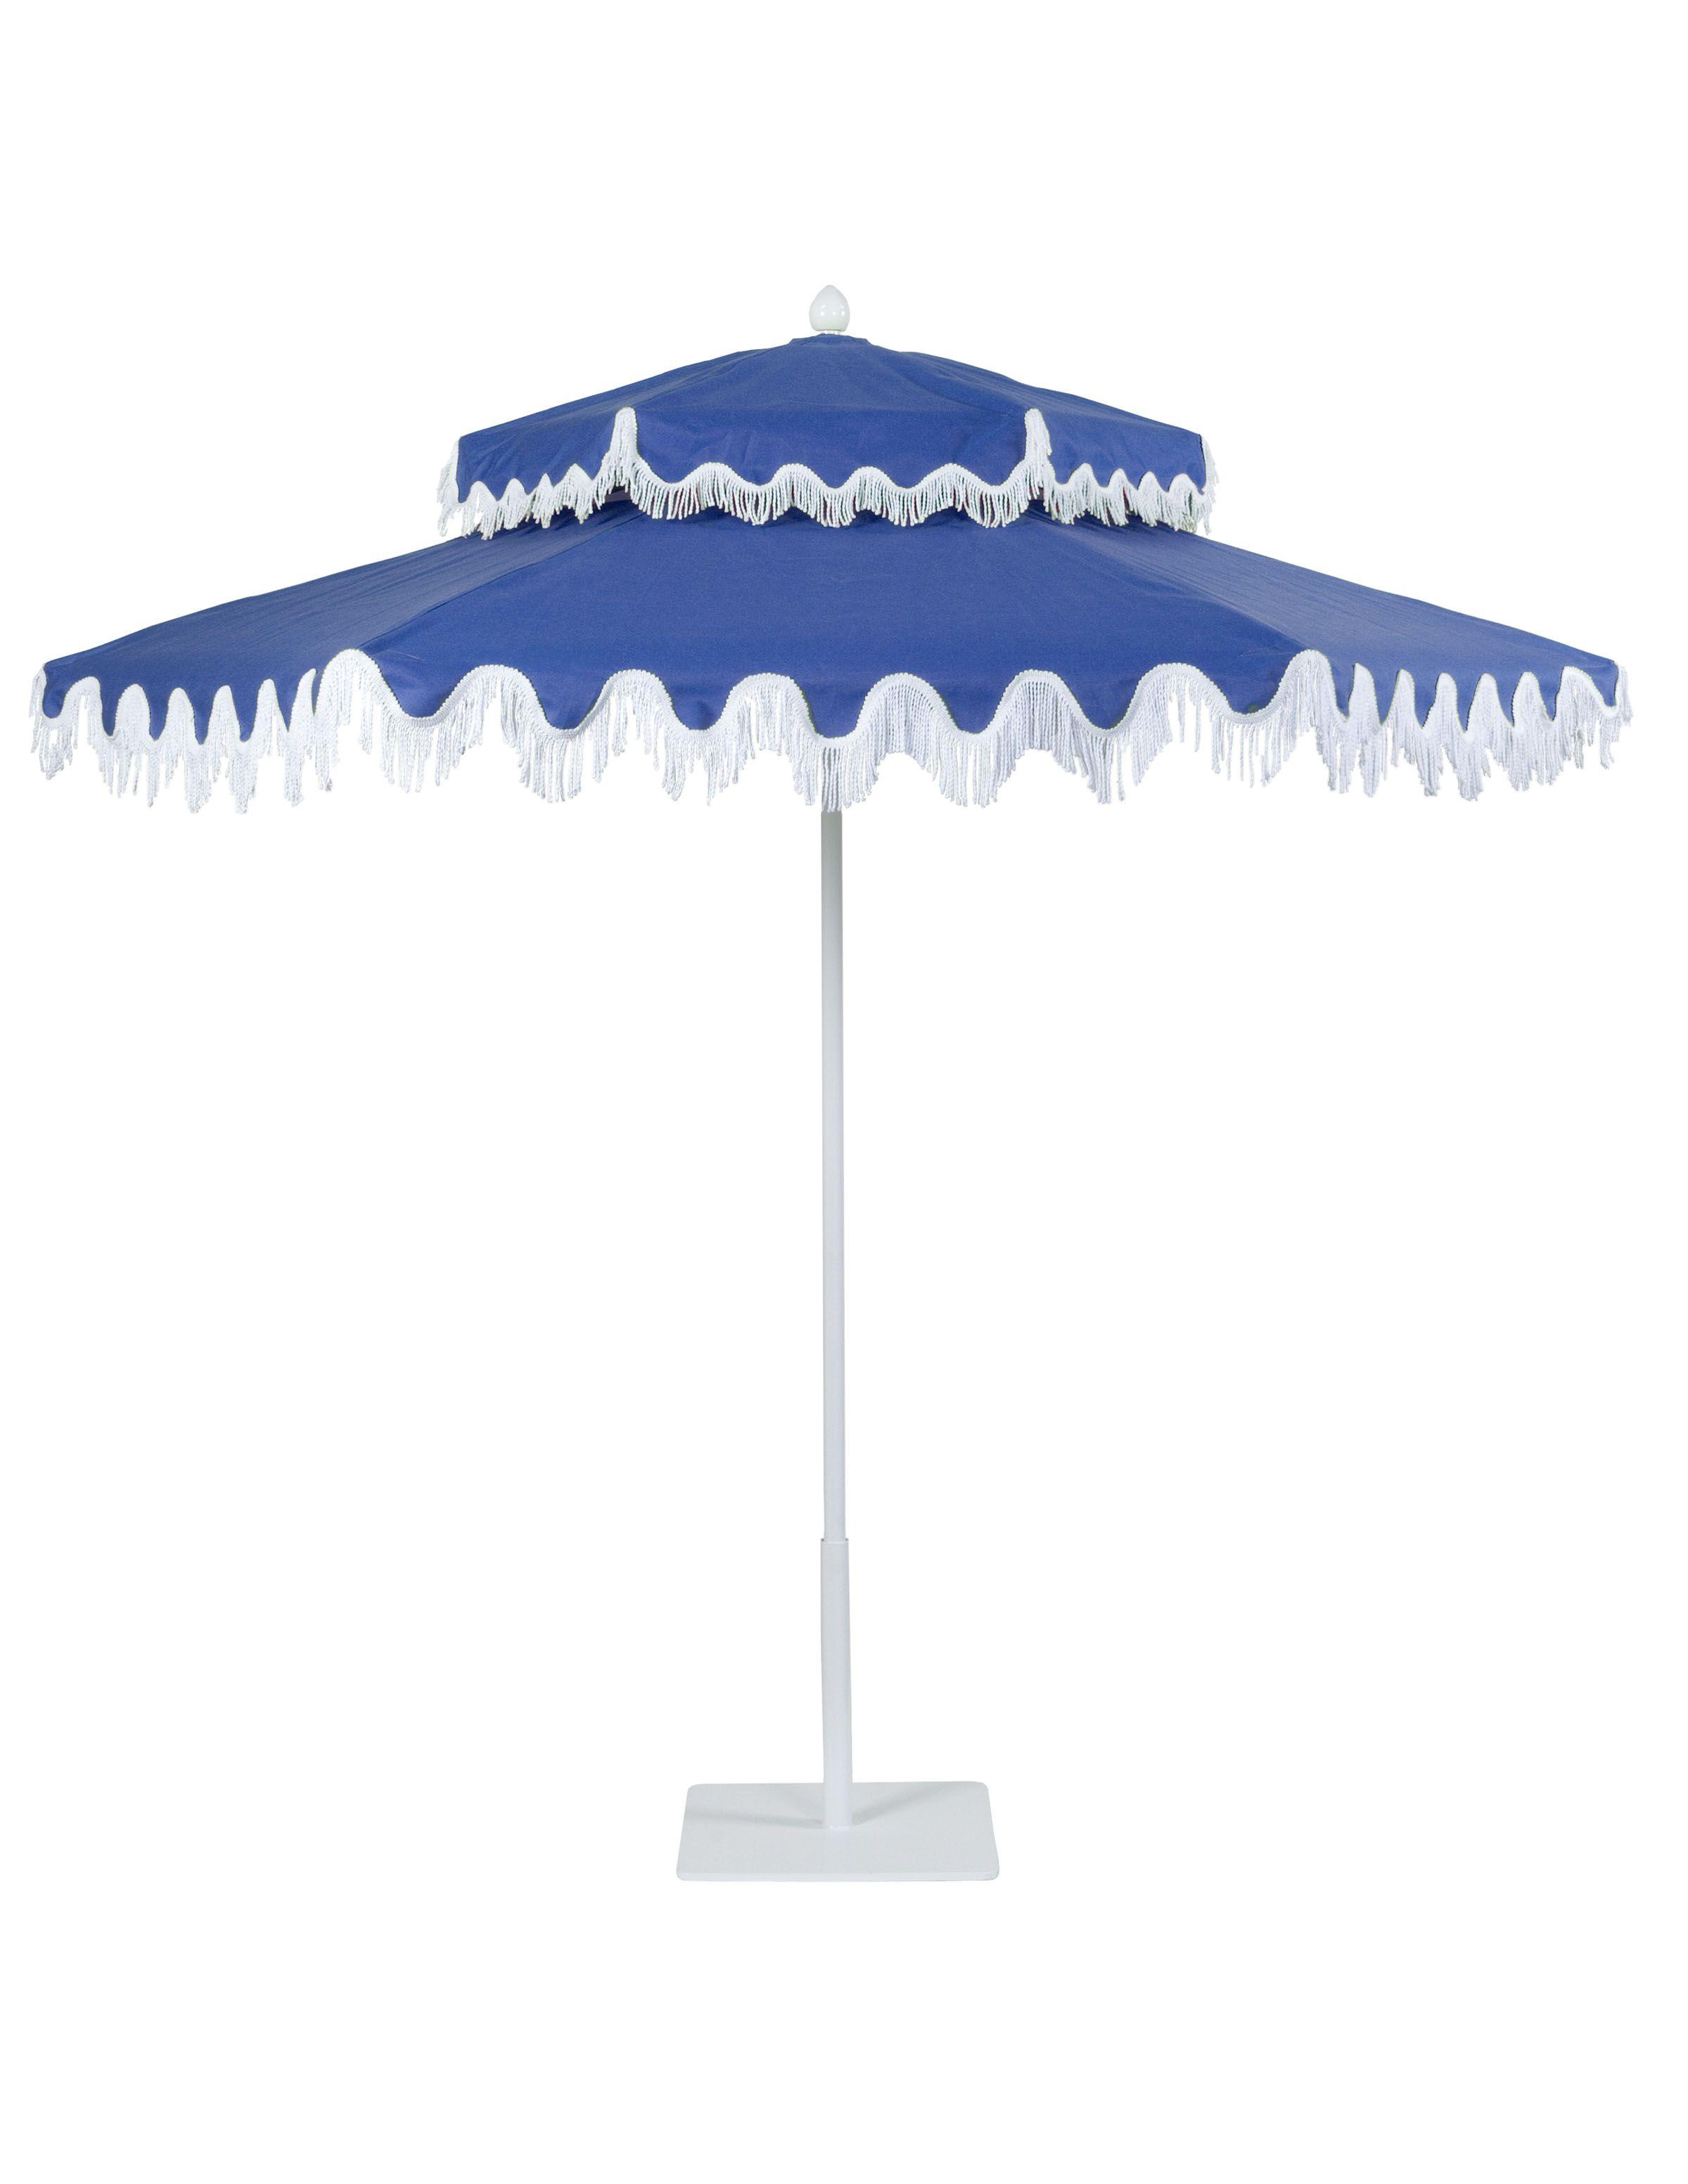 Santa Barbara Patio Umbrella: This Belongs In The Backyard Of My Dreams.